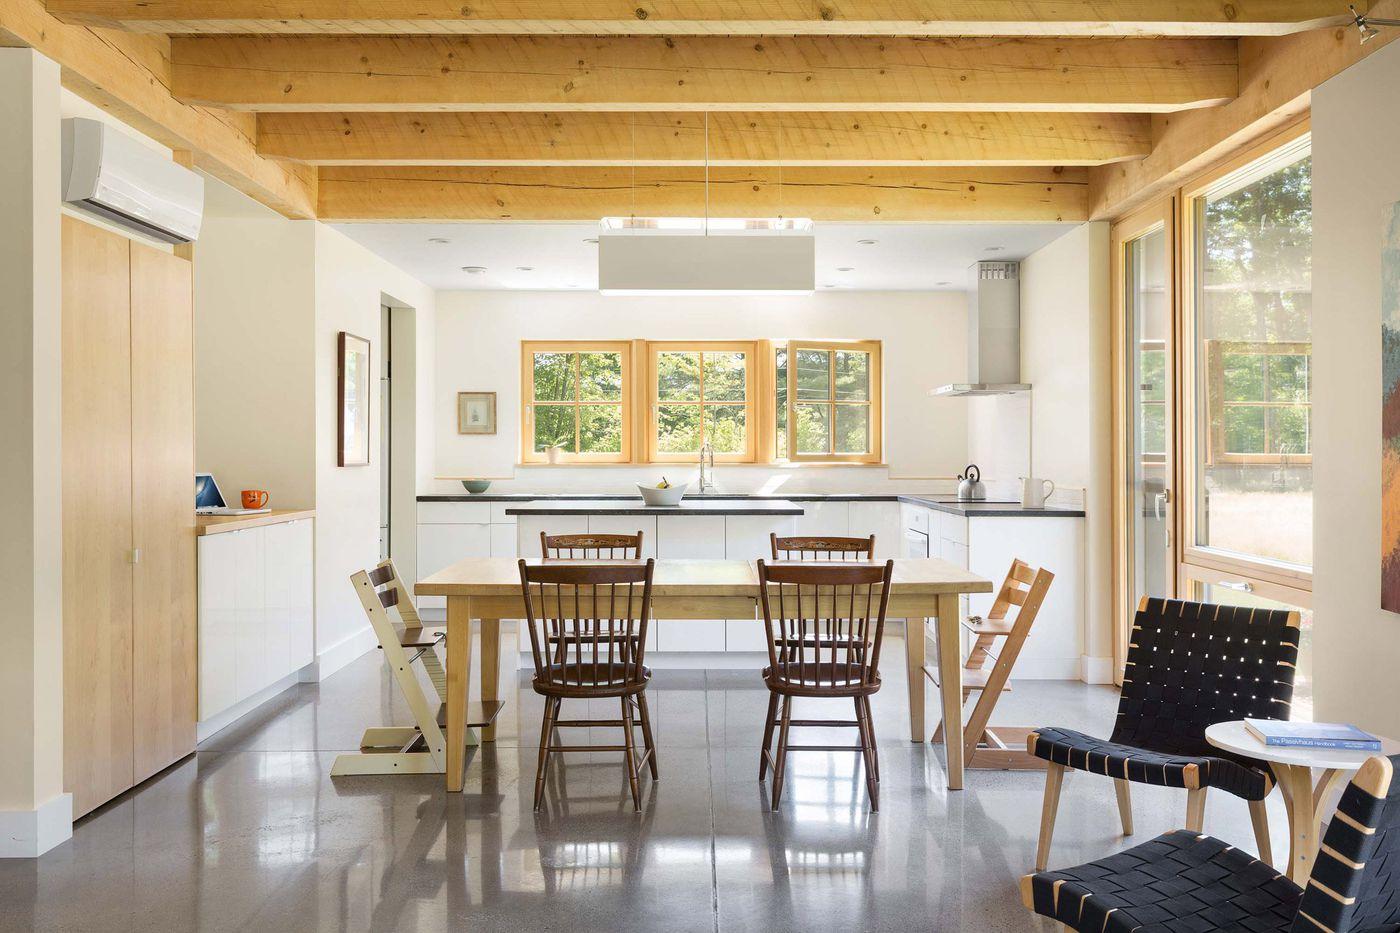 Prefab homes from Go Logic offer \'rural modernism\' assembled in 2 ...